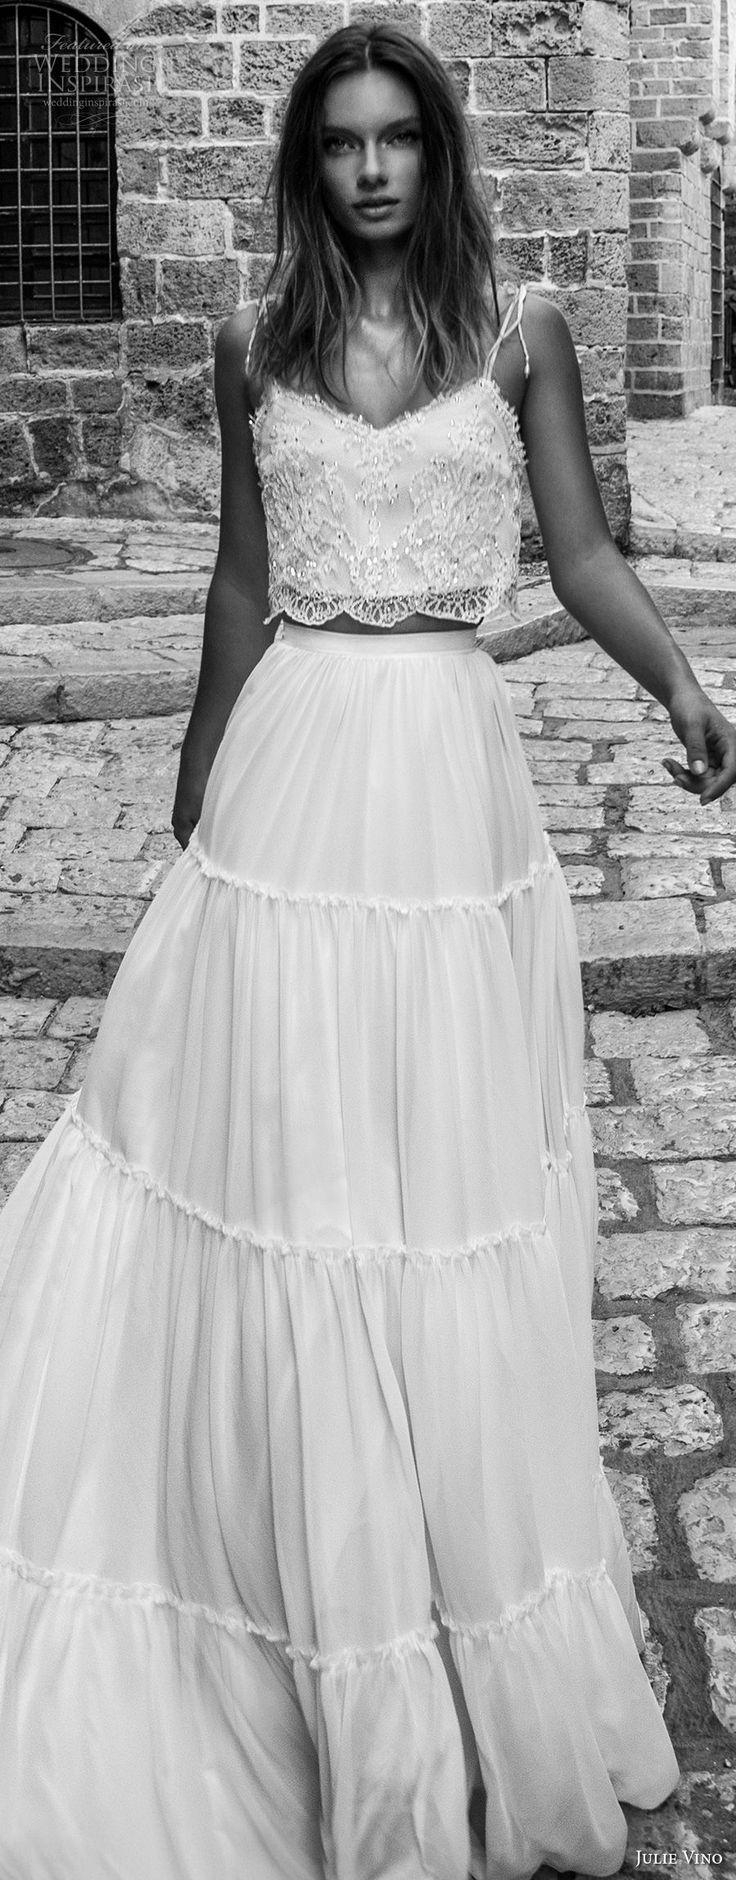 Best 25+ 2 piece wedding dress ideas on Pinterest | Two ...